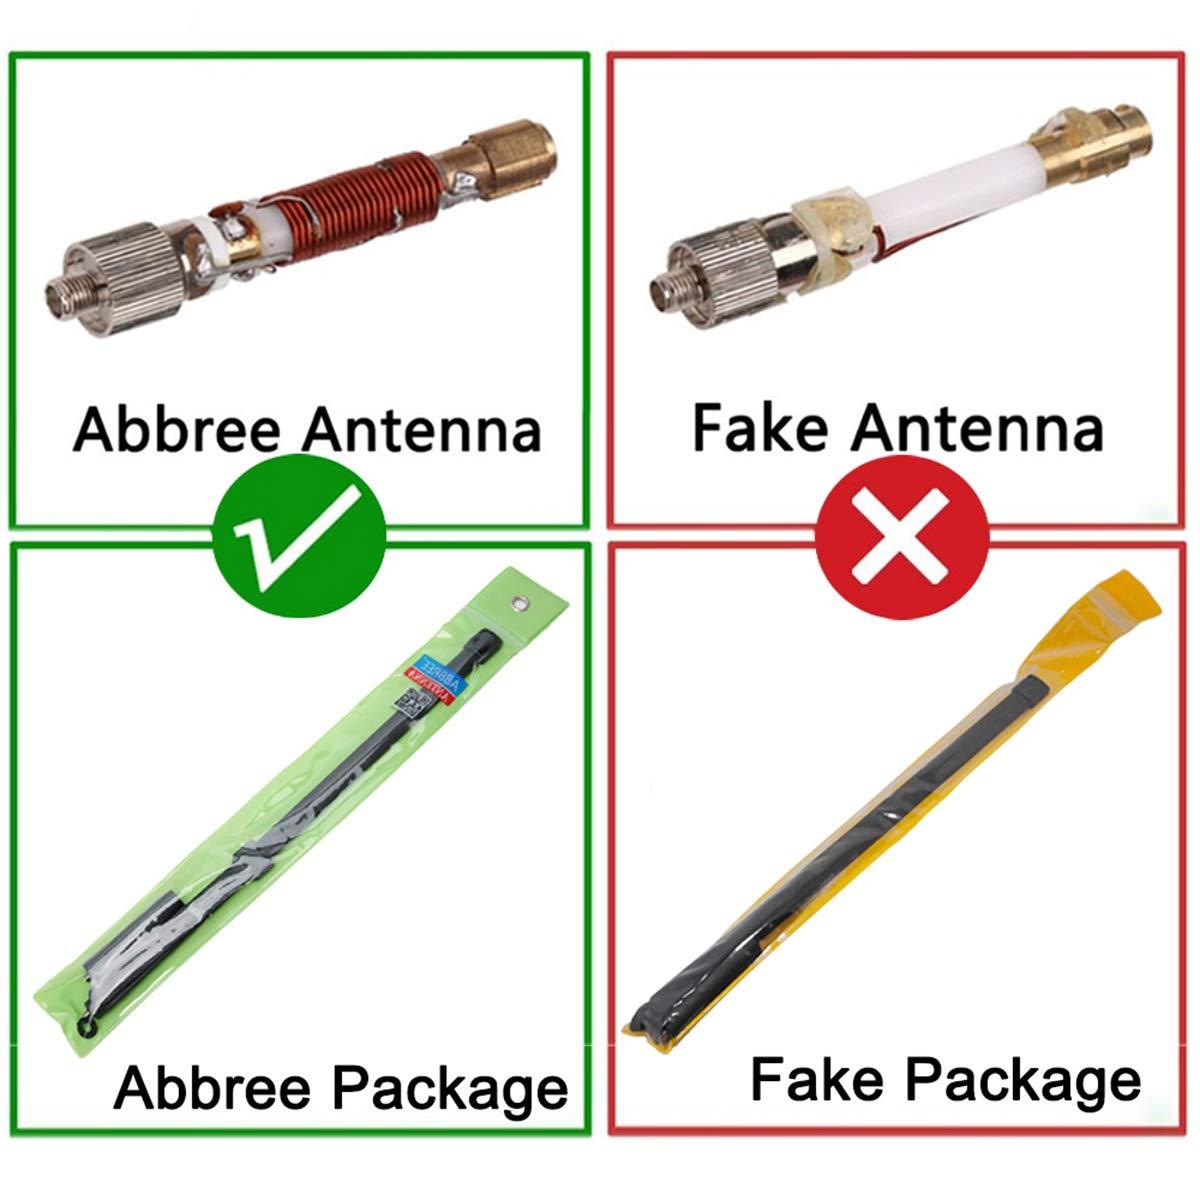 Antena t/áctica Plegable ABBREE SMA-Male VHF UHF de 42.5 Pulgadas de Doble Banda 144//430 MHz para Yaesu TYT Wouxun Ham Walkie Talkie